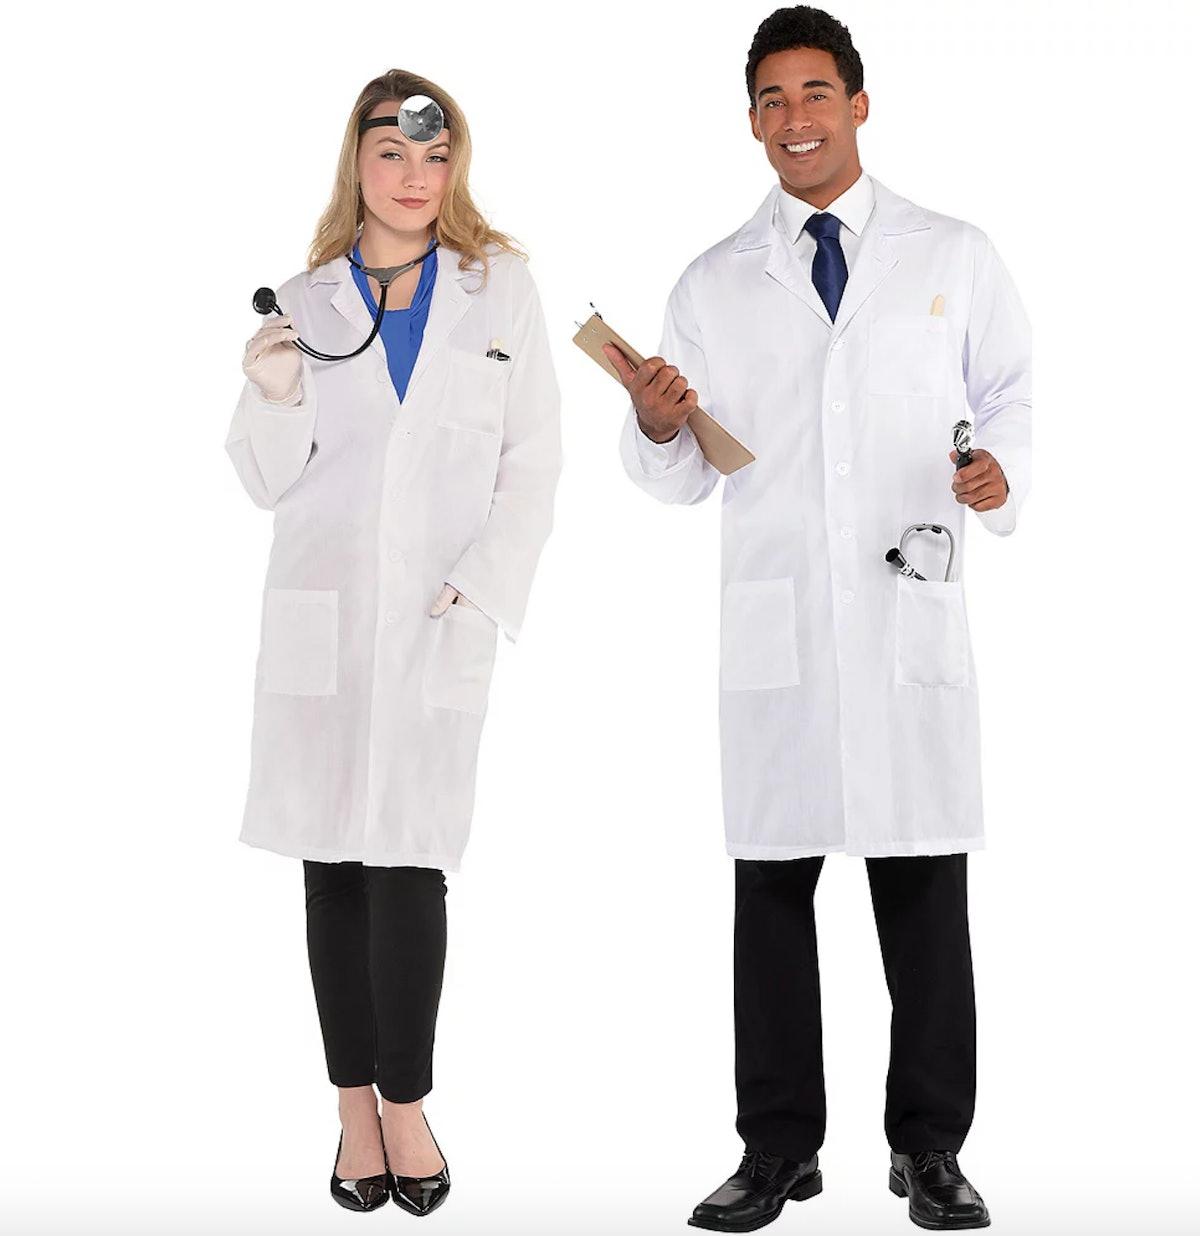 Moira Rose wore a lab coat on 'Schitt's Creek' to portray Dr. Clara Mandrake.